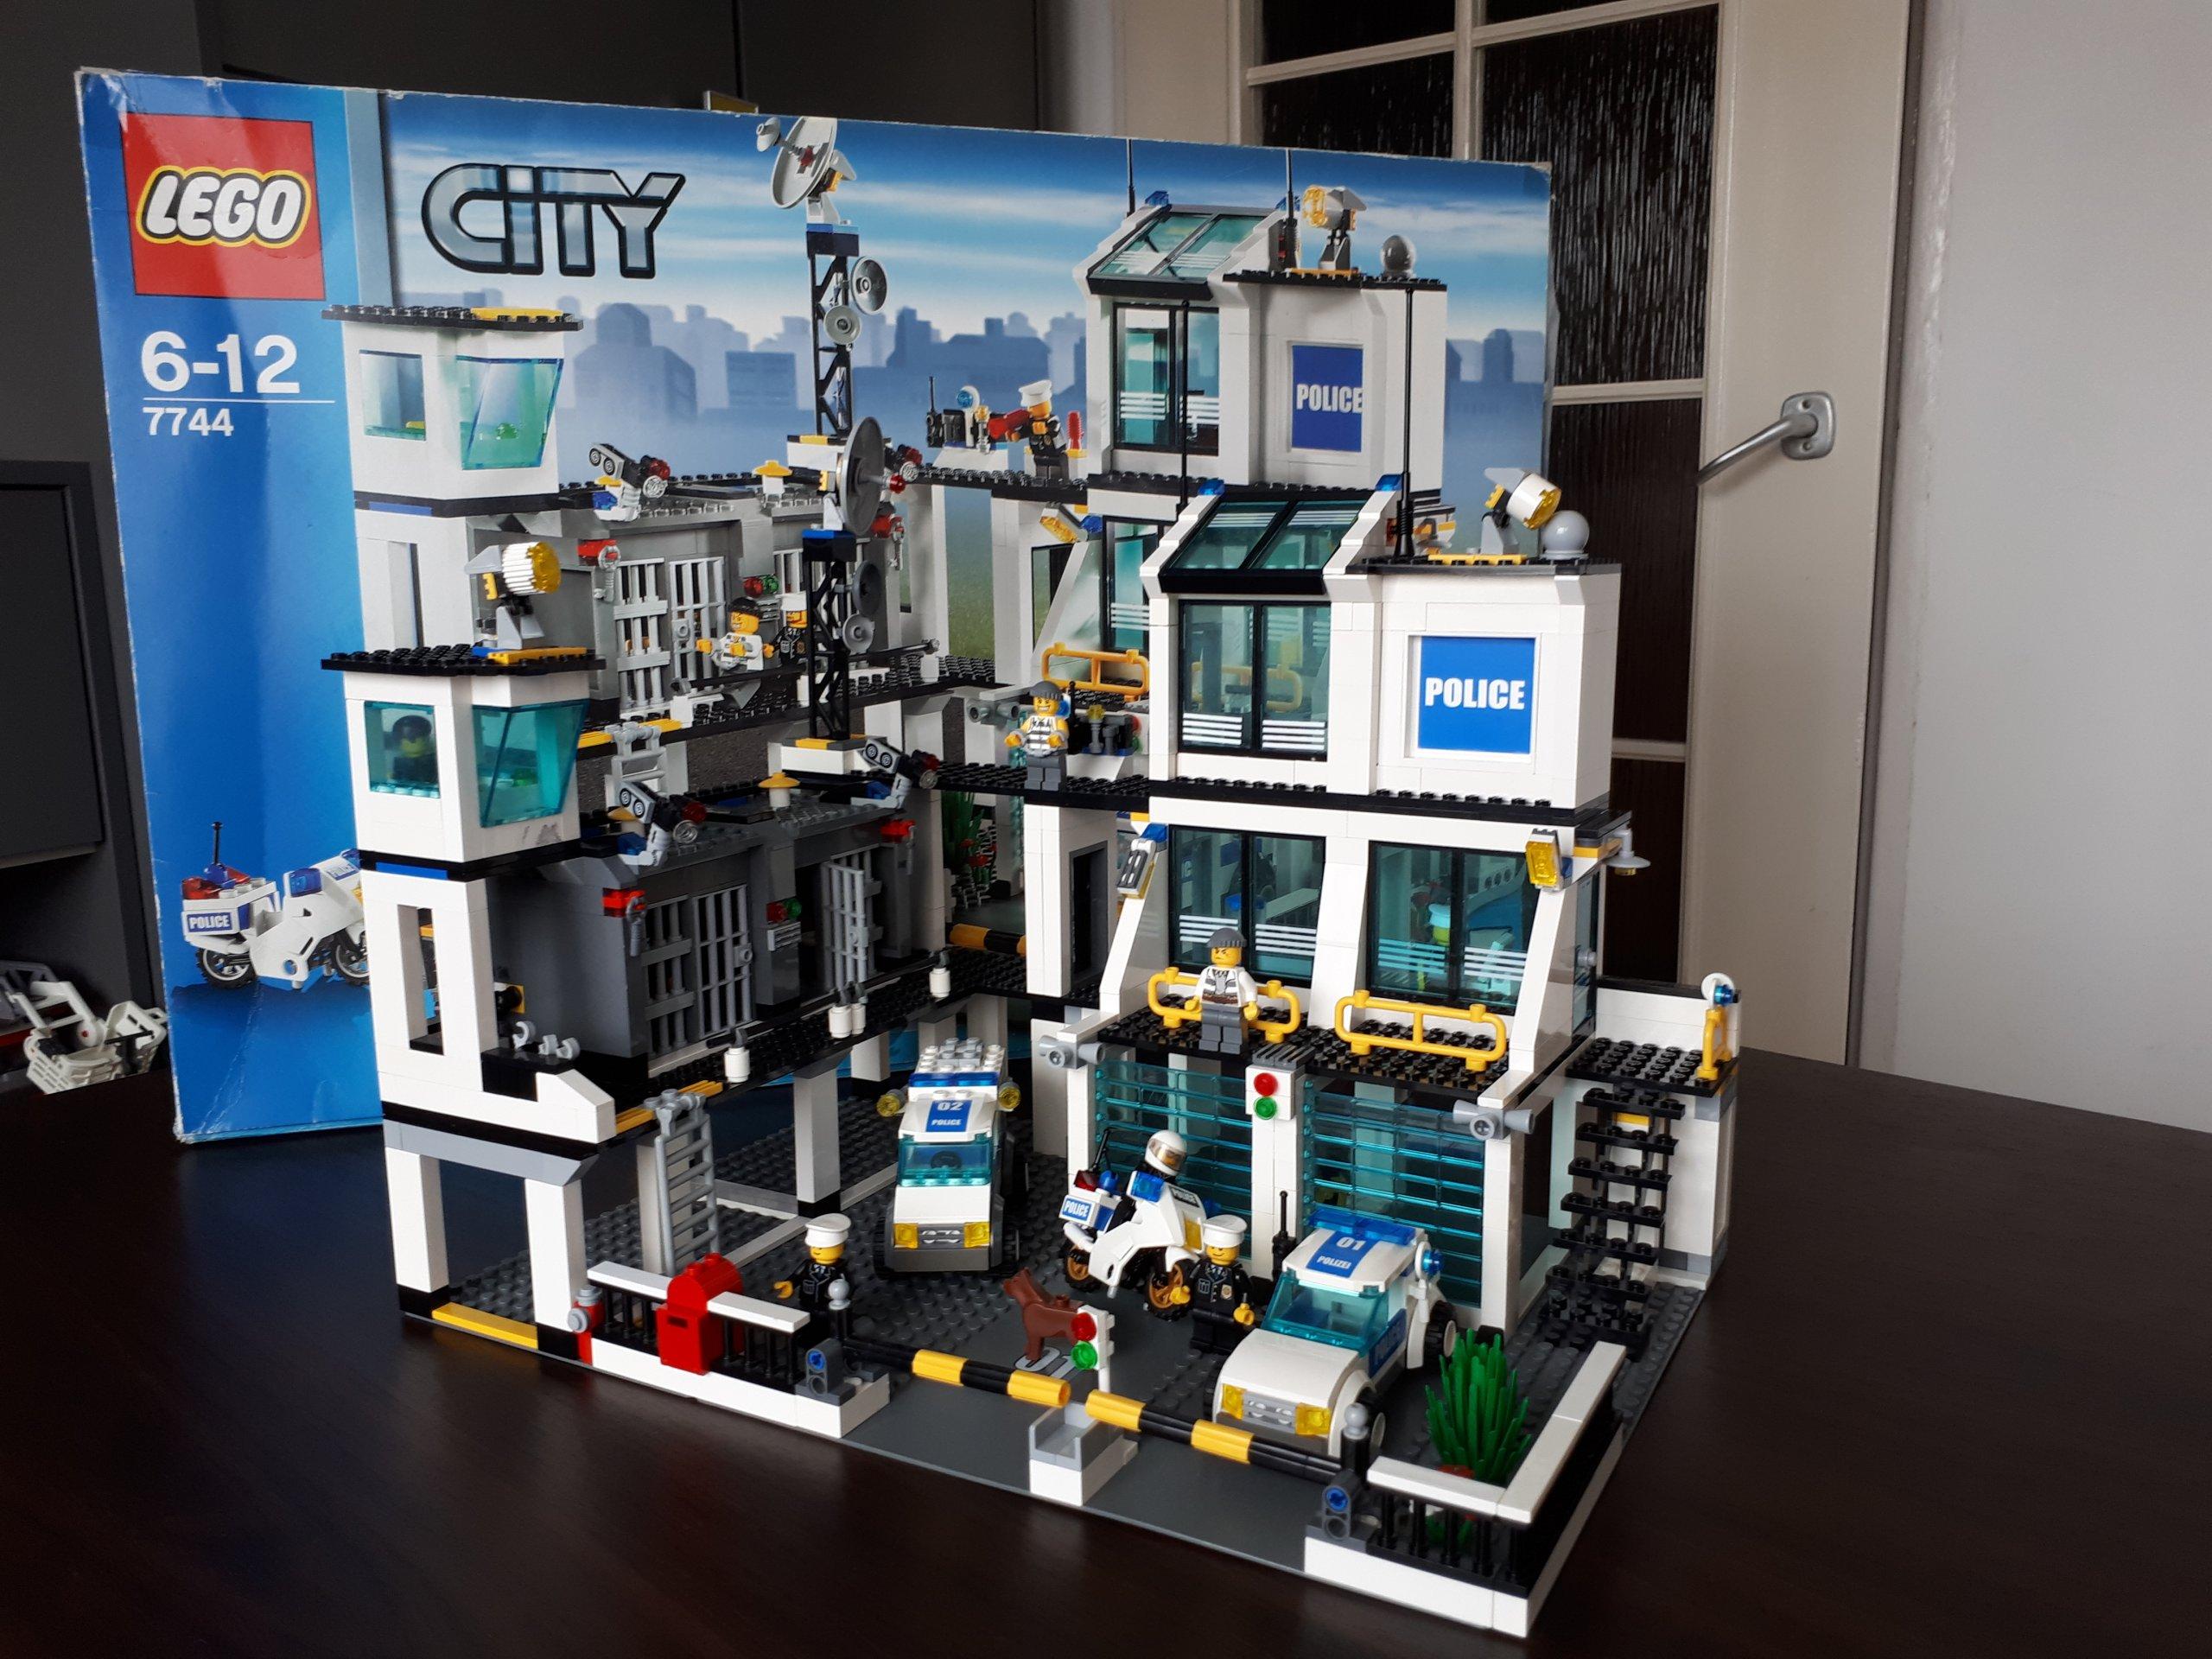 Lego Komisariat Policji 7744 Kompletne 100 7309688618 Oficjalne